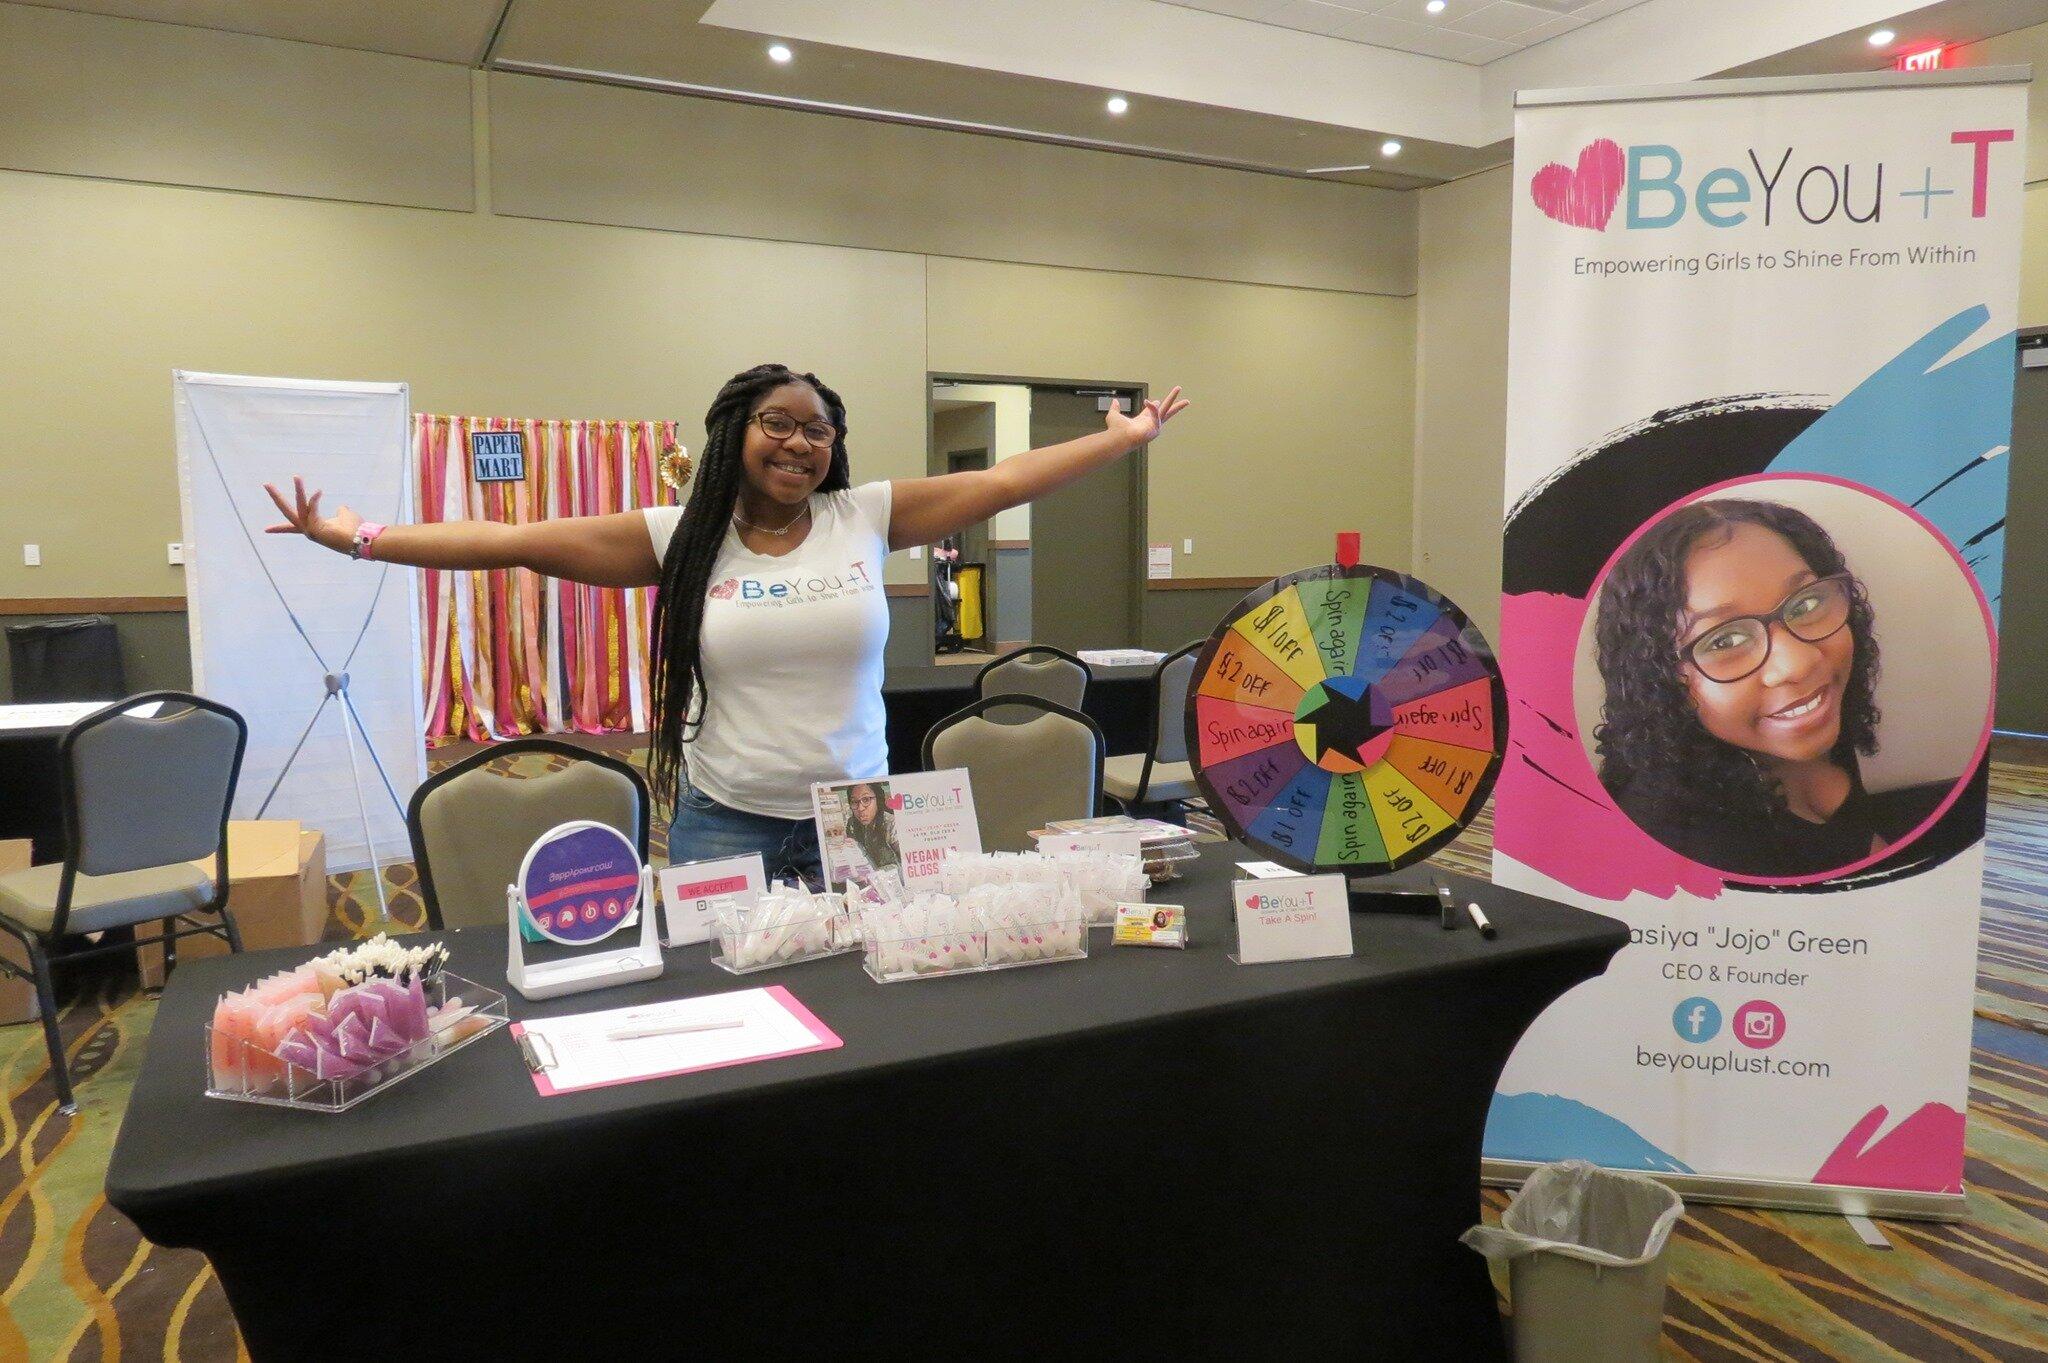 Jasiya Jojo Green Teenpreneur and Founder of a Vegan lip gloss line